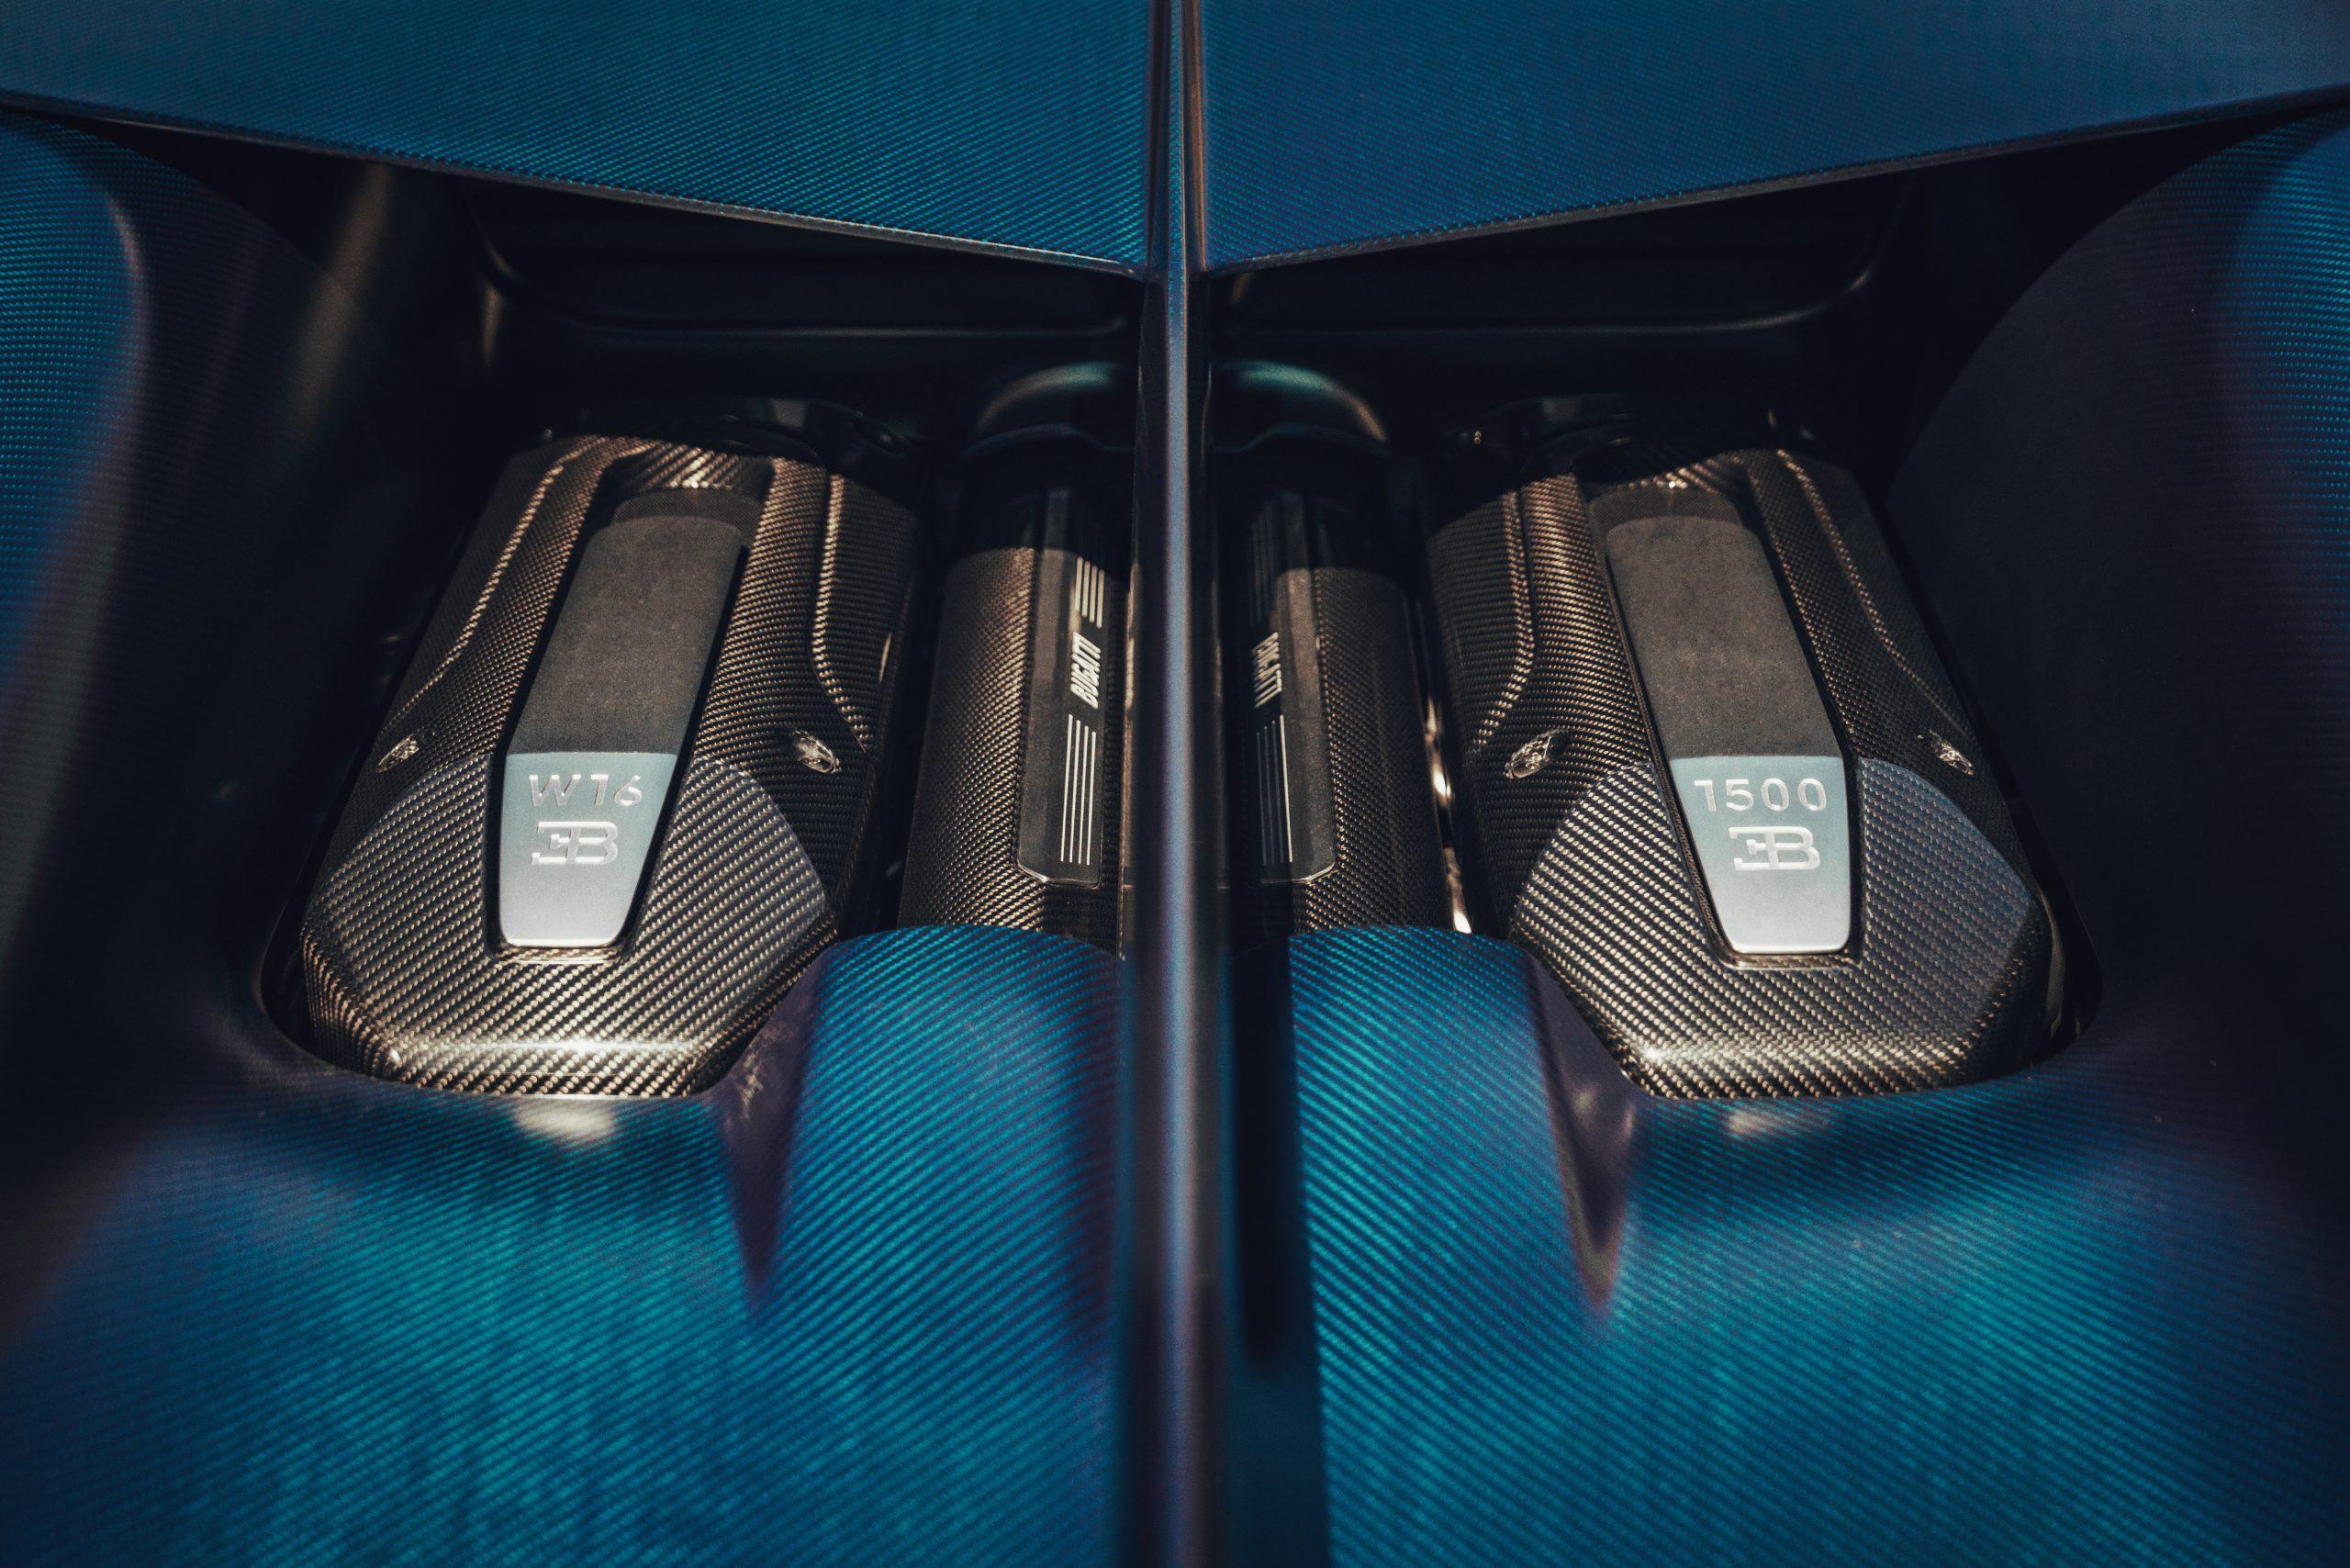 Bugatti Divo W-16 engine